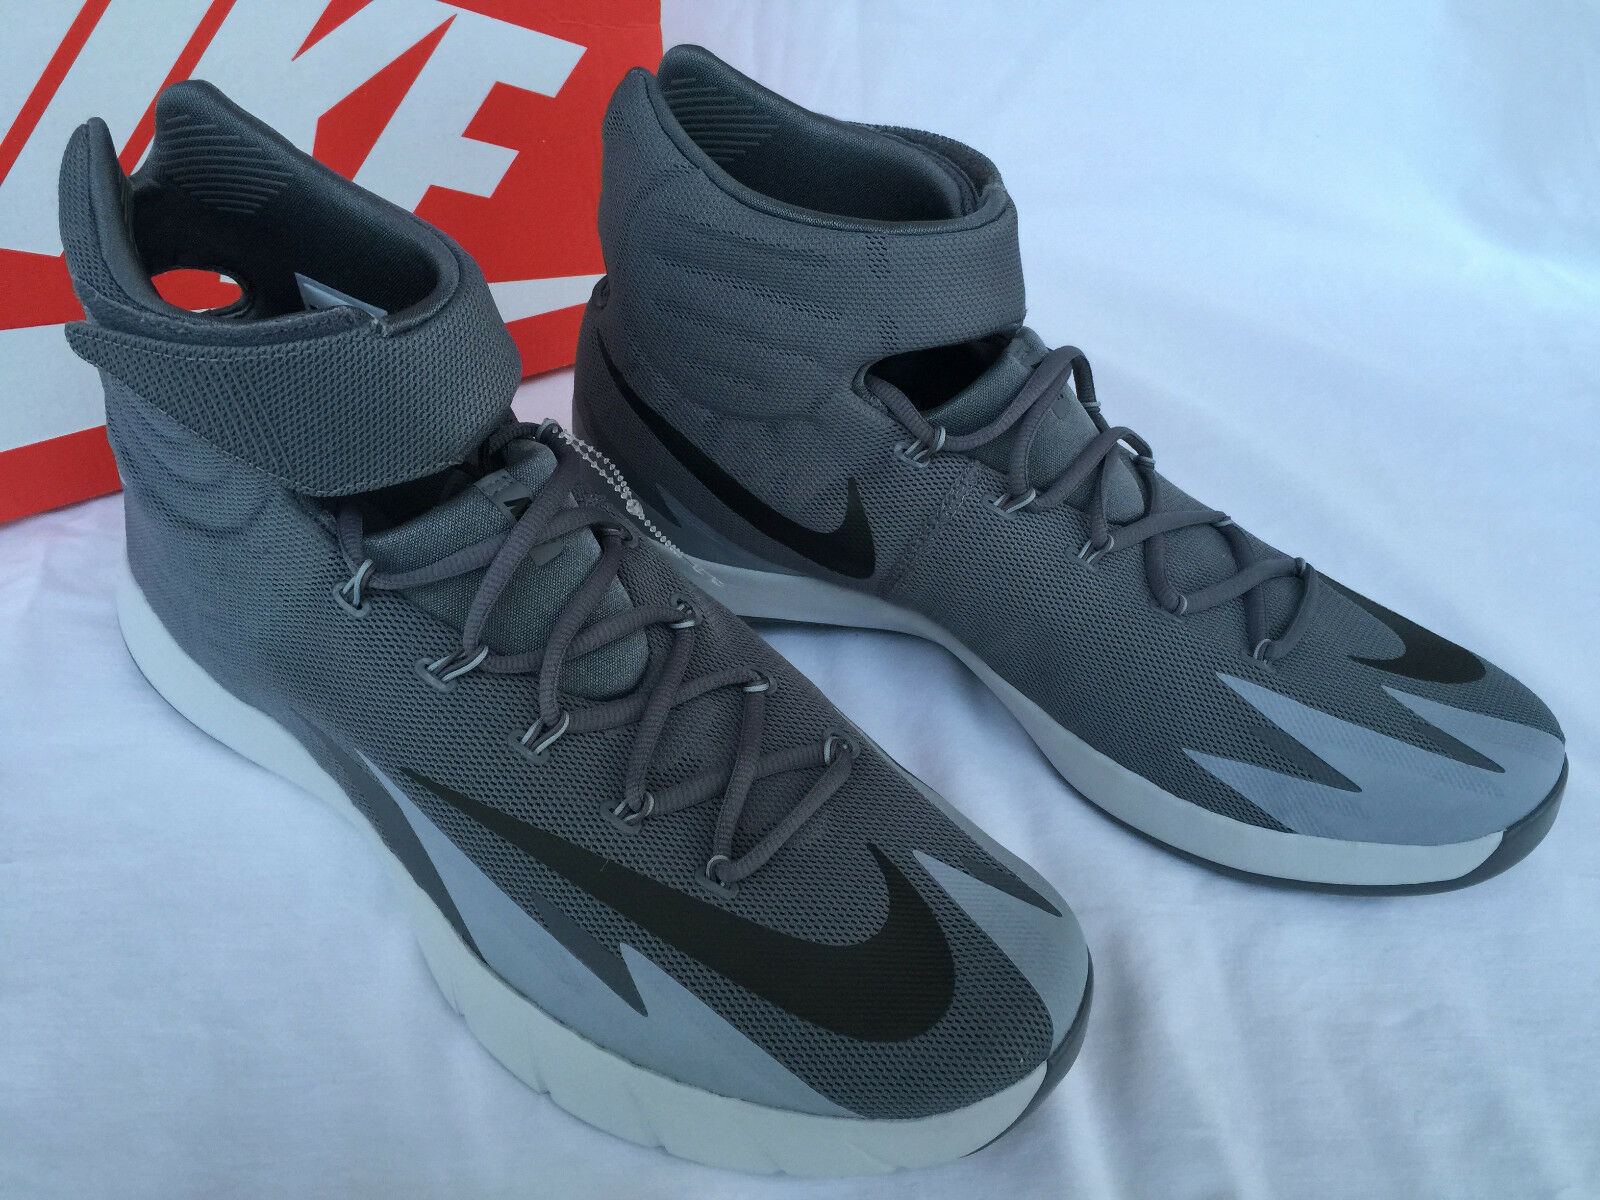 Nike Zoom Hyperrev Kyrie Erving 643301-013 Gray Basketball Shoes Men's 16.5 new